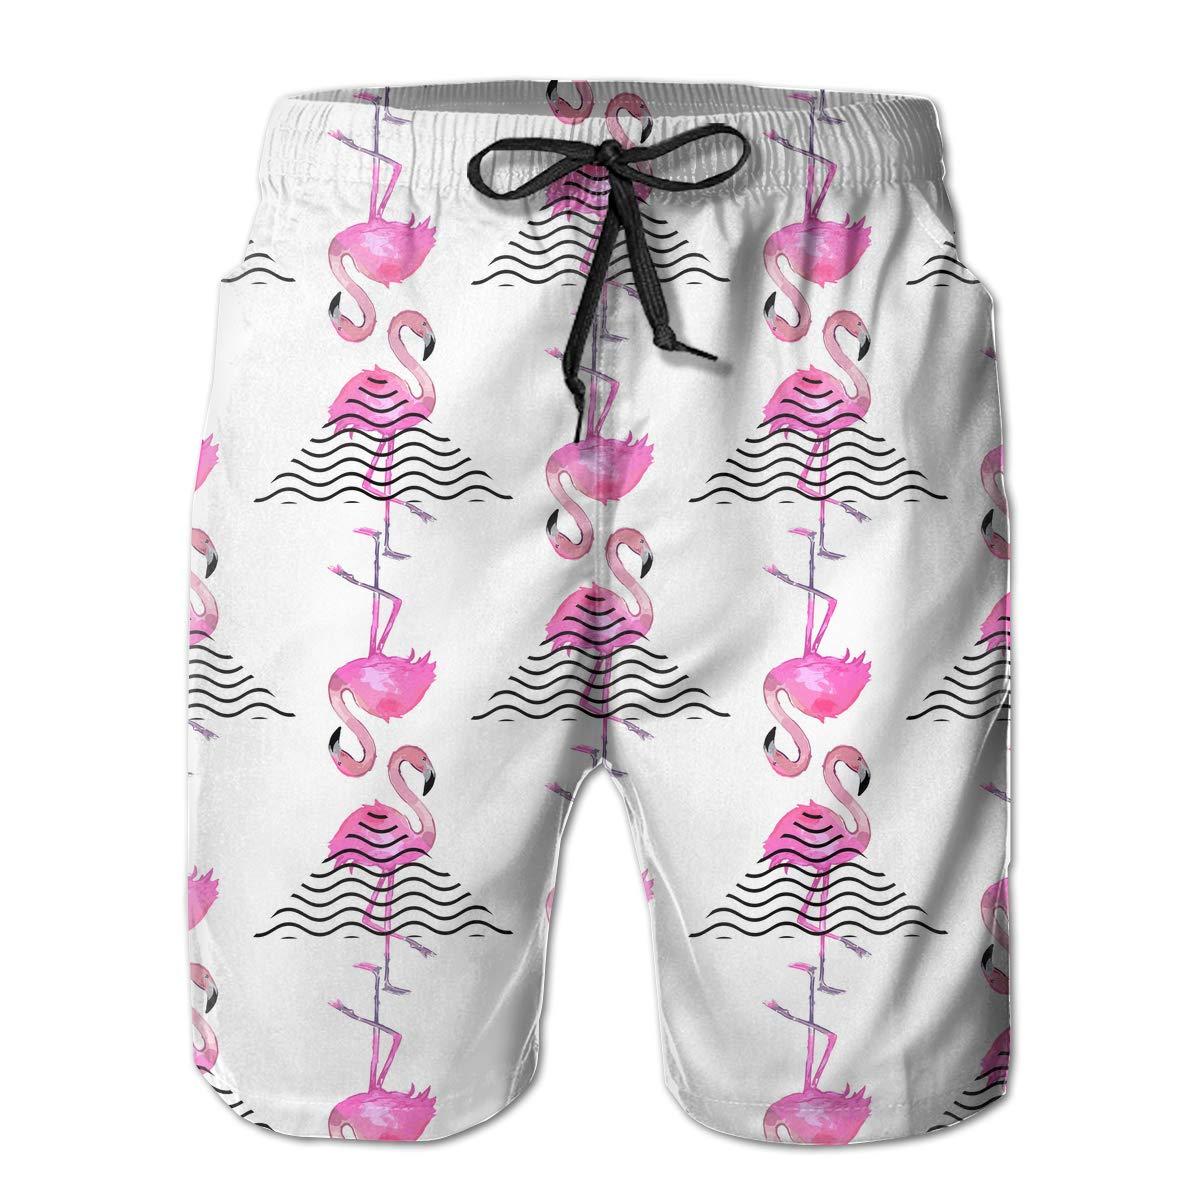 Flamingo Pattern Mens Boardshorts Printing Swim Trunks